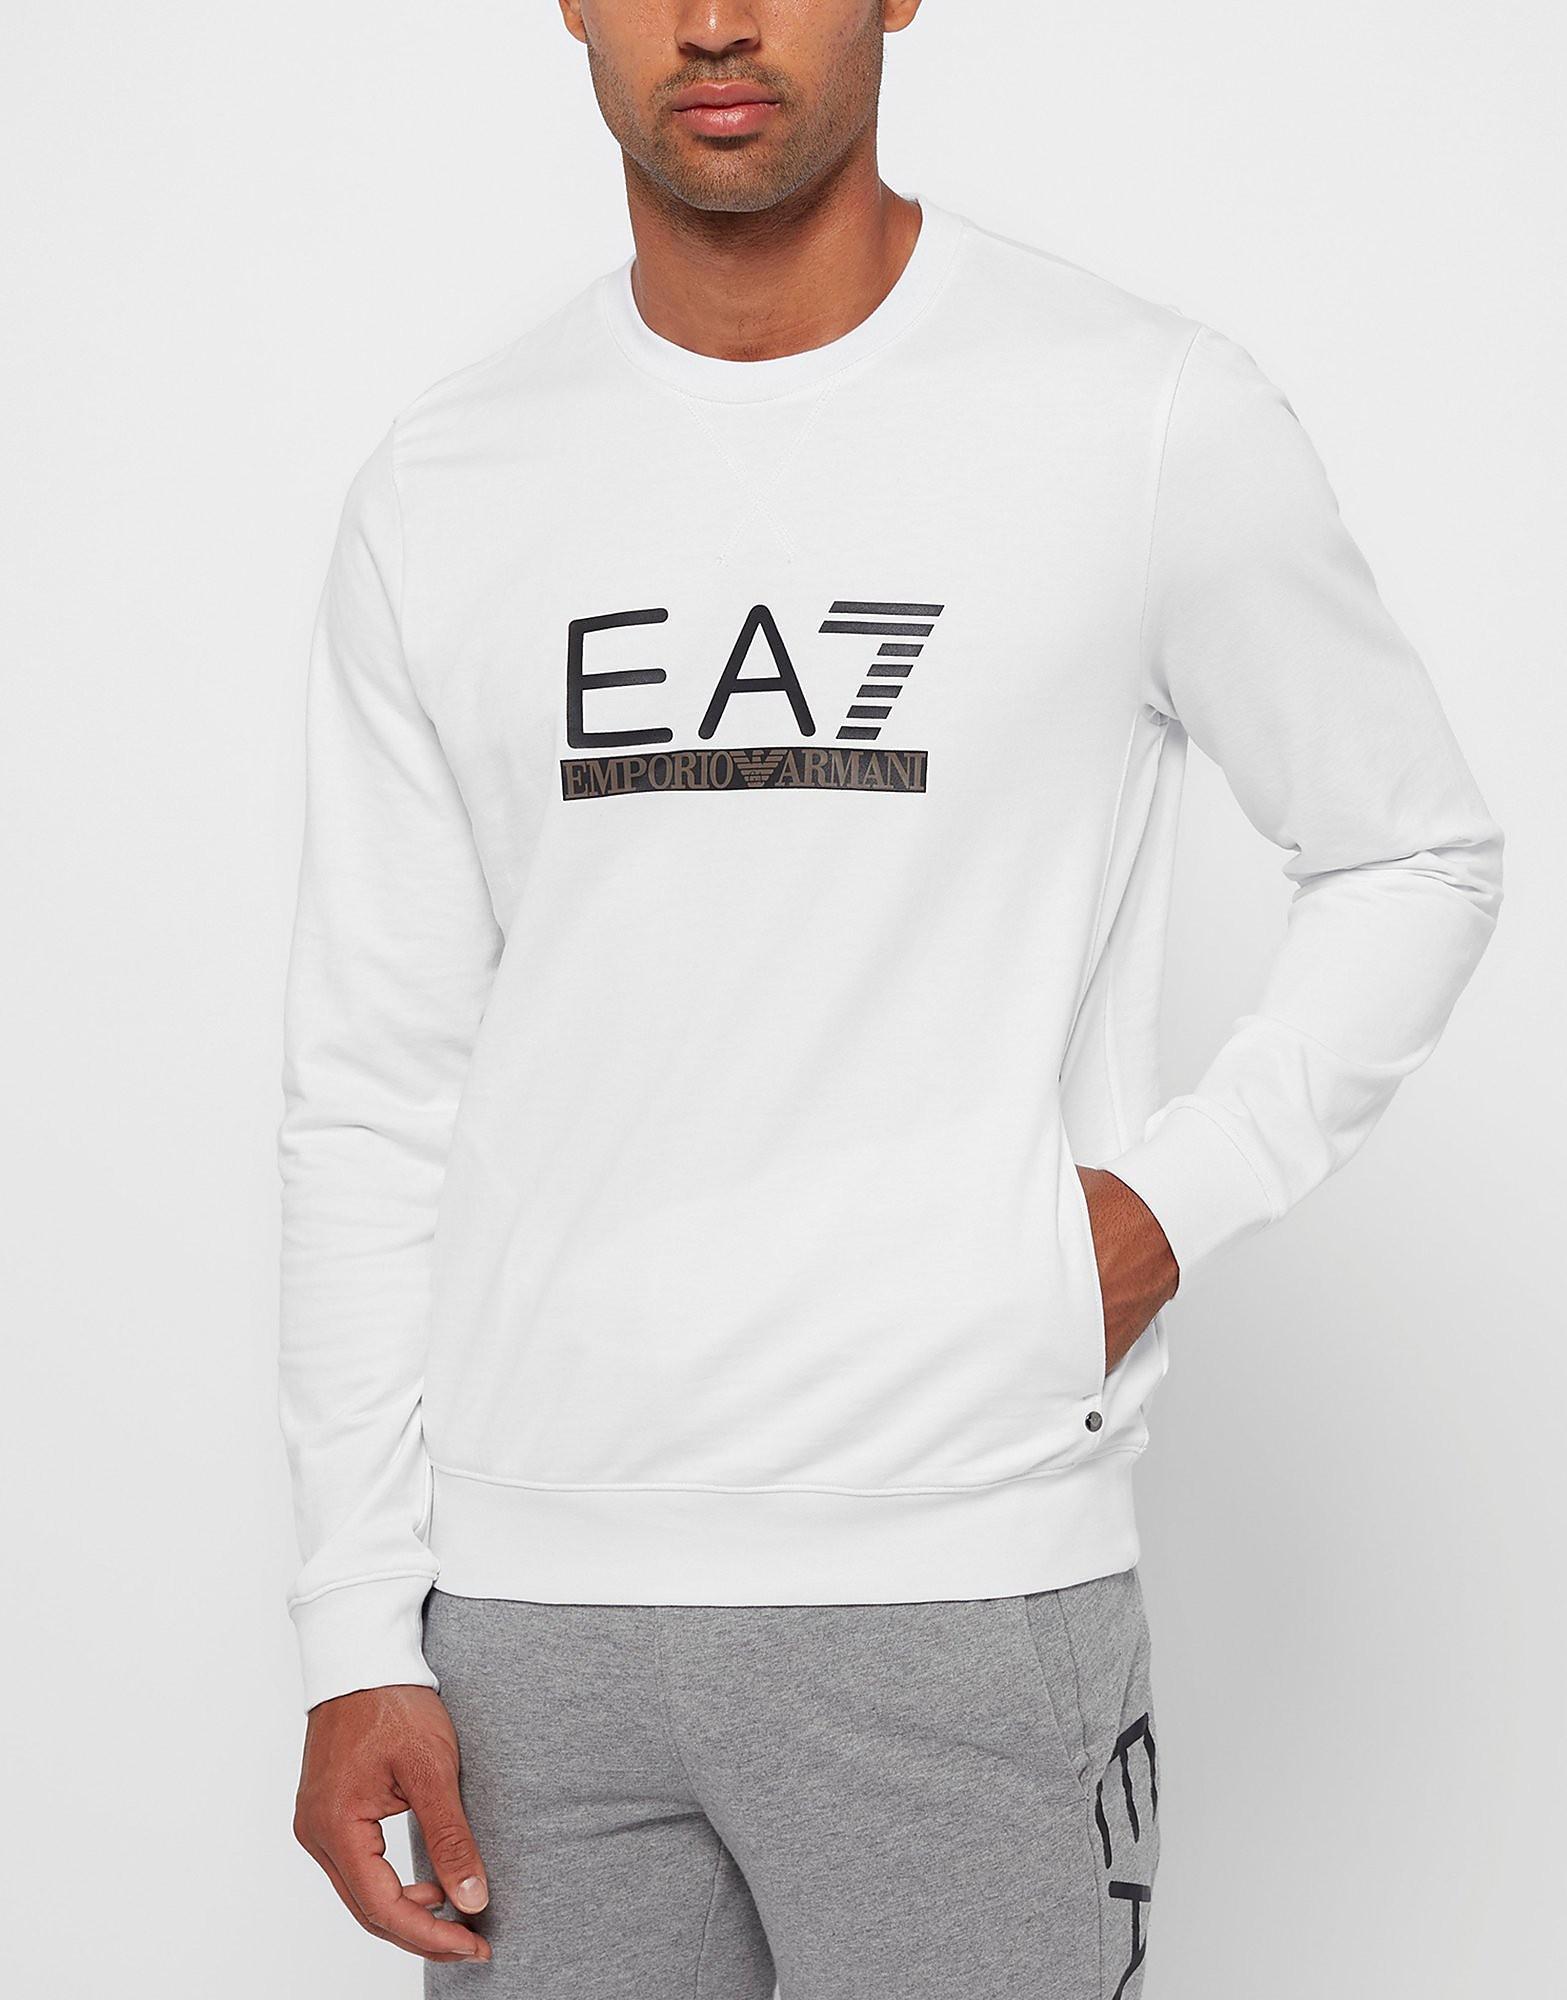 Emporio Armani EA7 Leather Crew Neck Sweatshirt - Exclusive